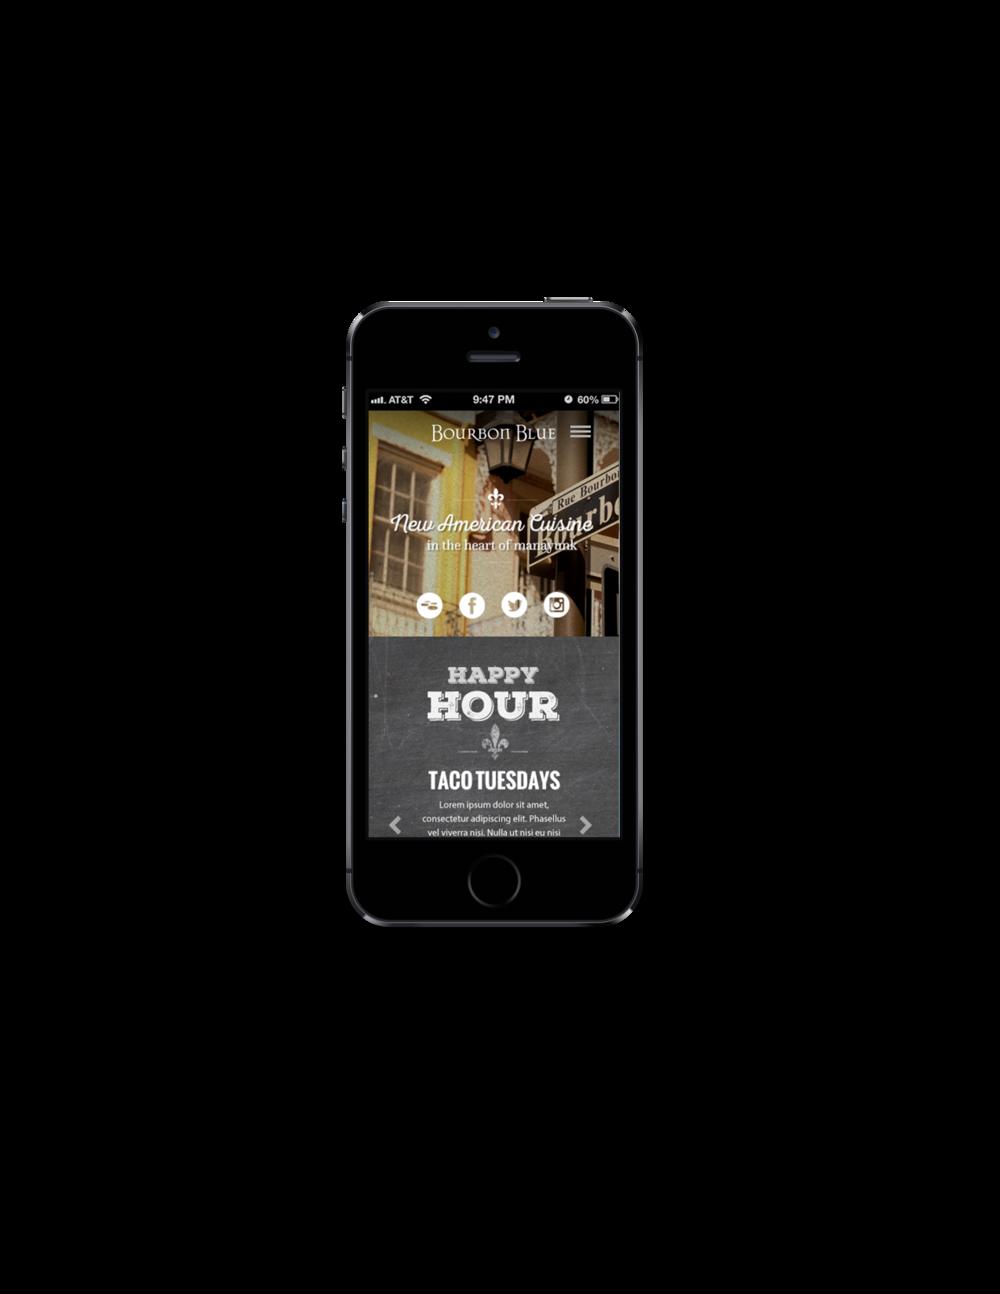 BourbonBlue-Homepage_Mobile.png